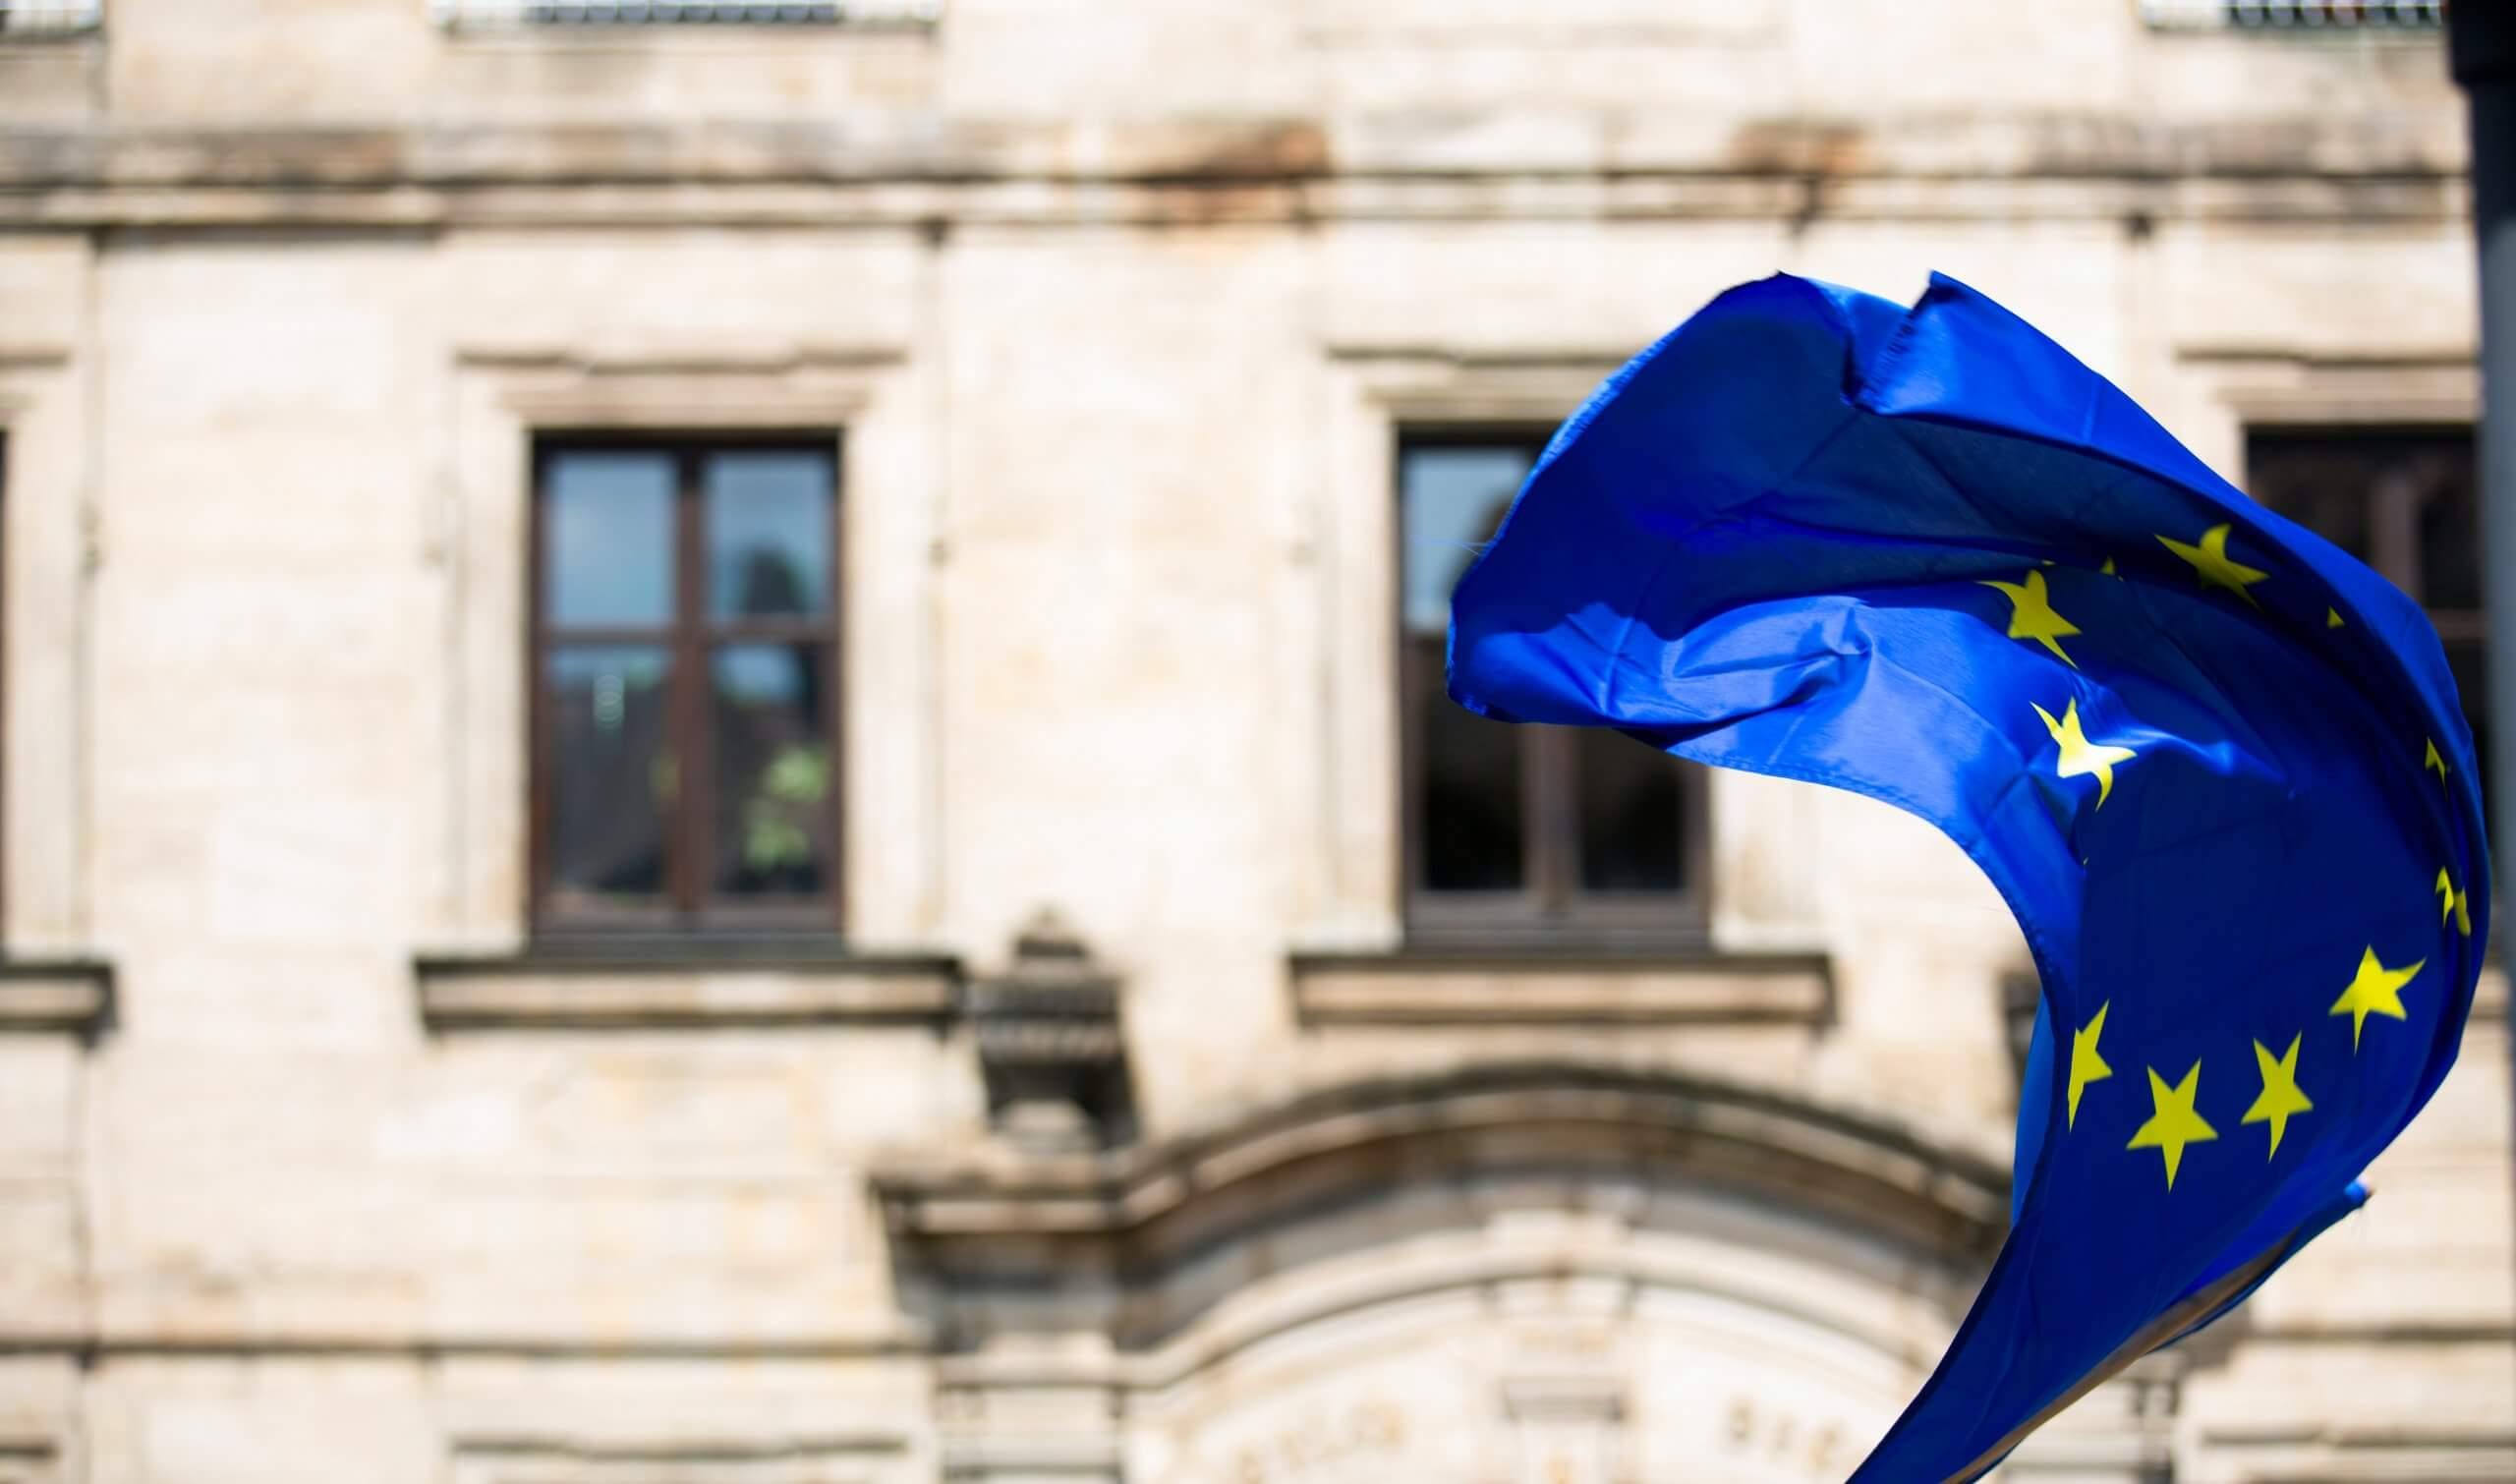 Poziv za dodjelu sredstava iz Fonda solidarnosti EU za obnovu prirodnih zona